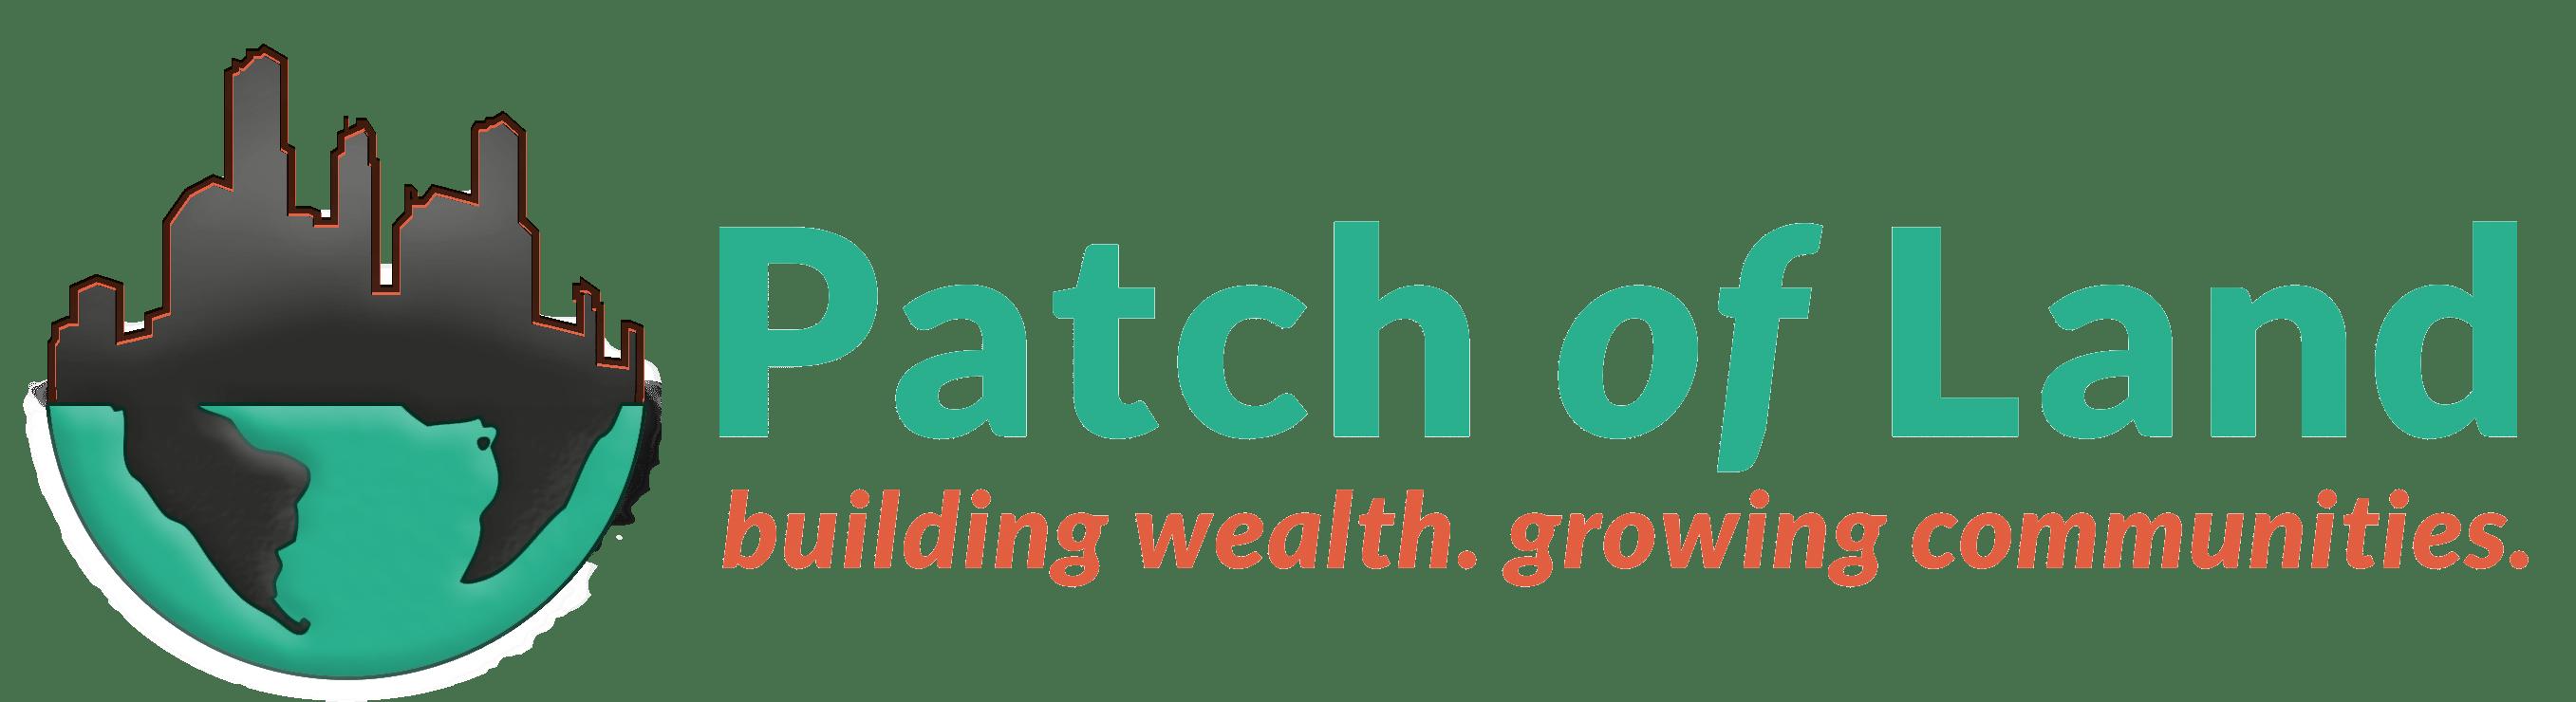 Patch of Land company logo